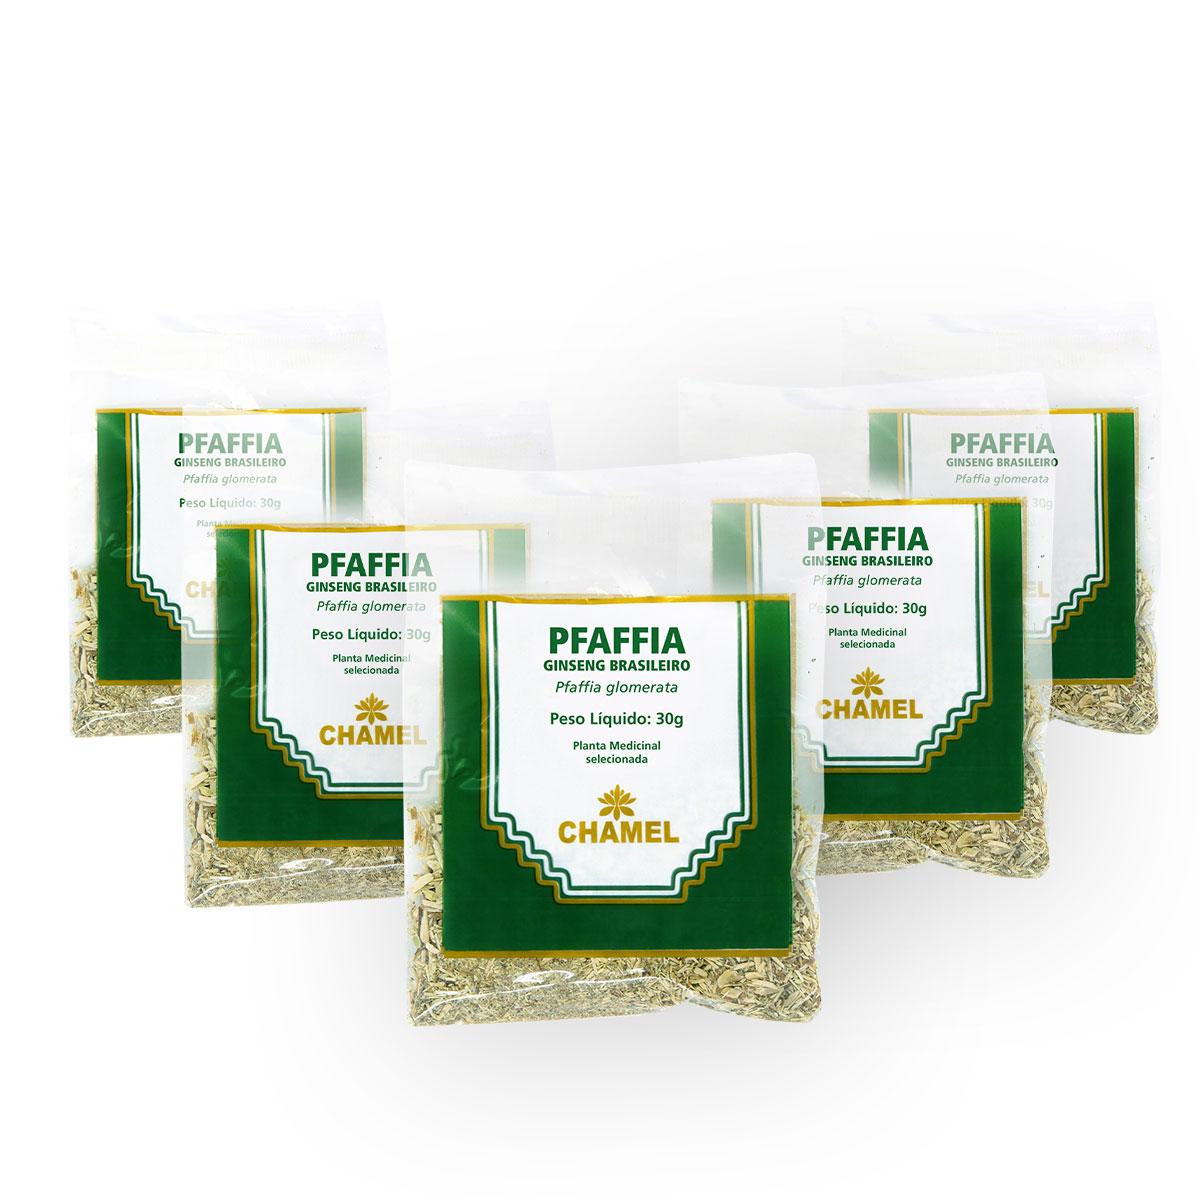 Ginseng Brasileiro 30g Chamel com 5 Unidades - Chá Raiz